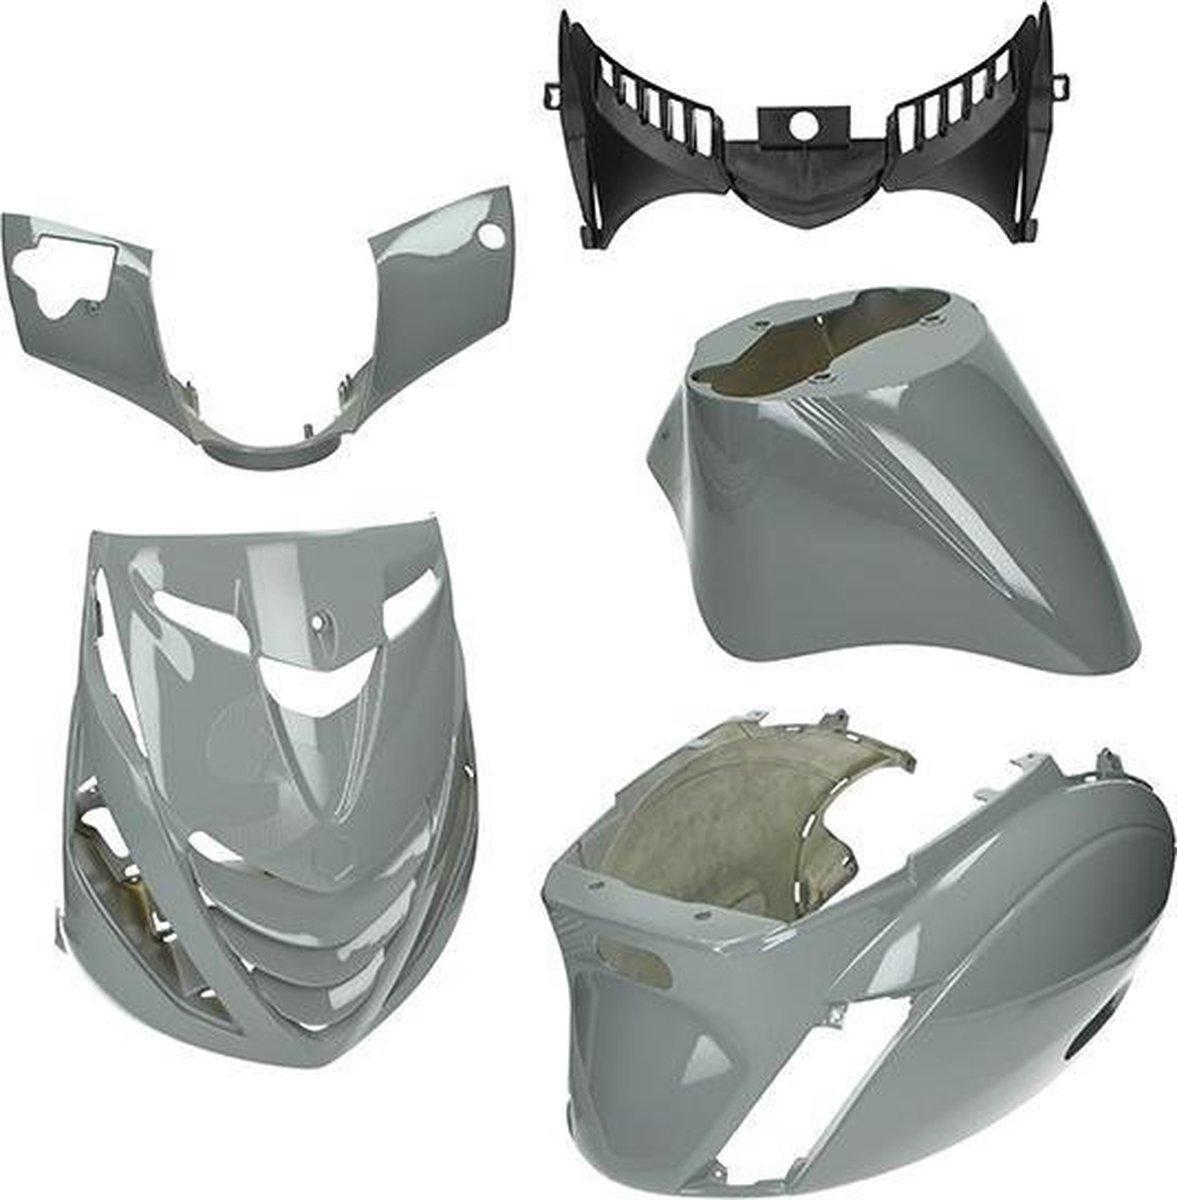 Kappenset Nardo grey Piaggio Zip 2000 grijs DMP 5-delig